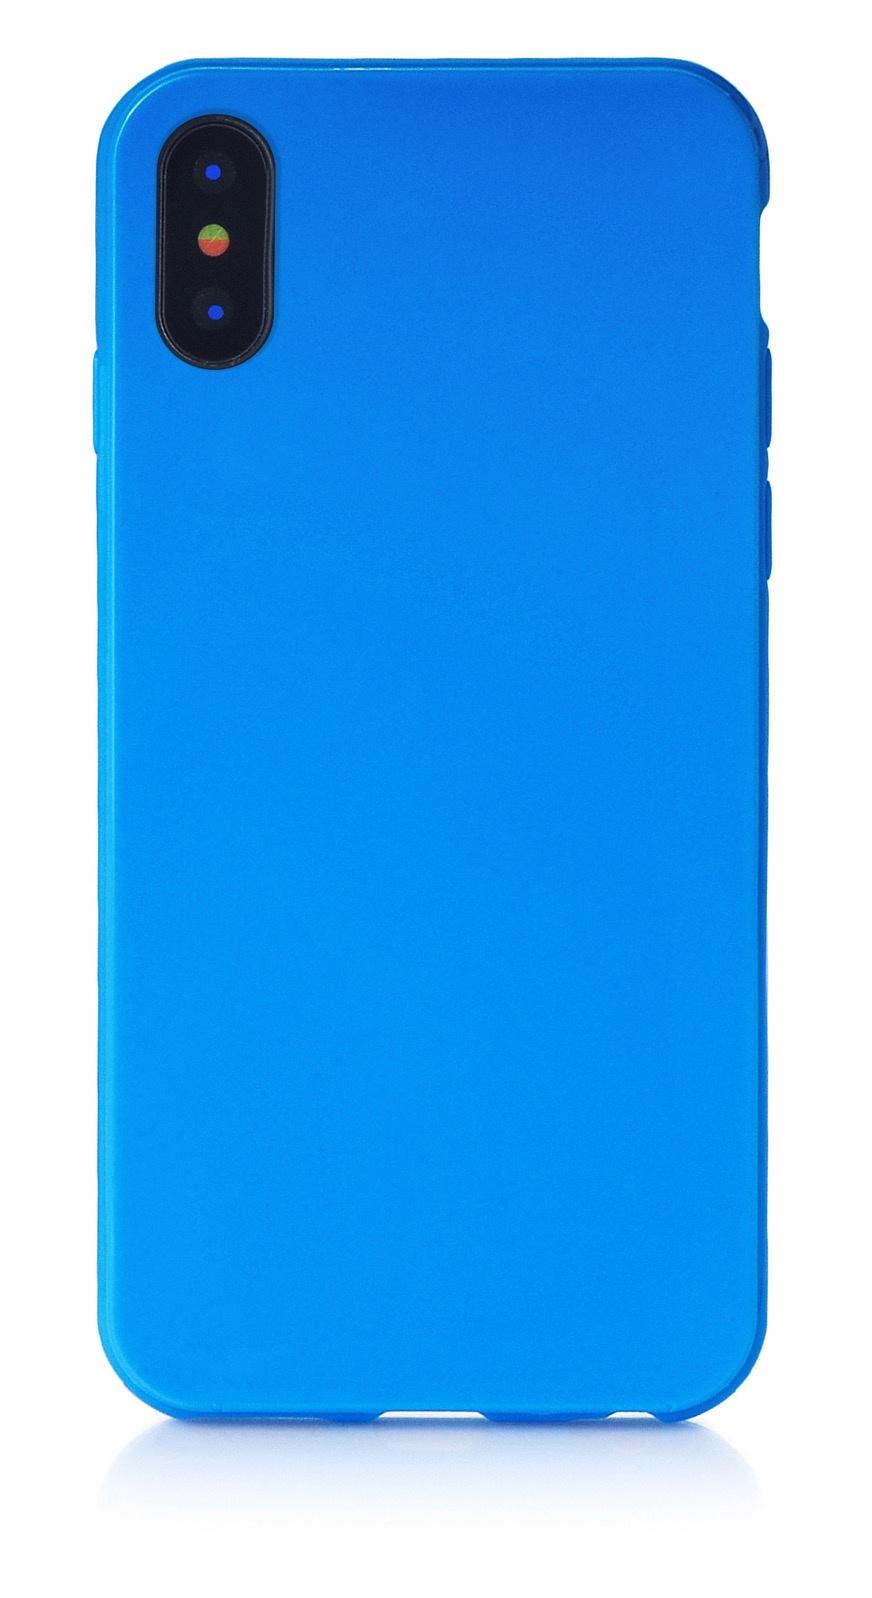 "Чехол для сотового телефона iNeez накладка силикон мыльница 905041 для Apple Iphone X/XS 5.8"", синий"